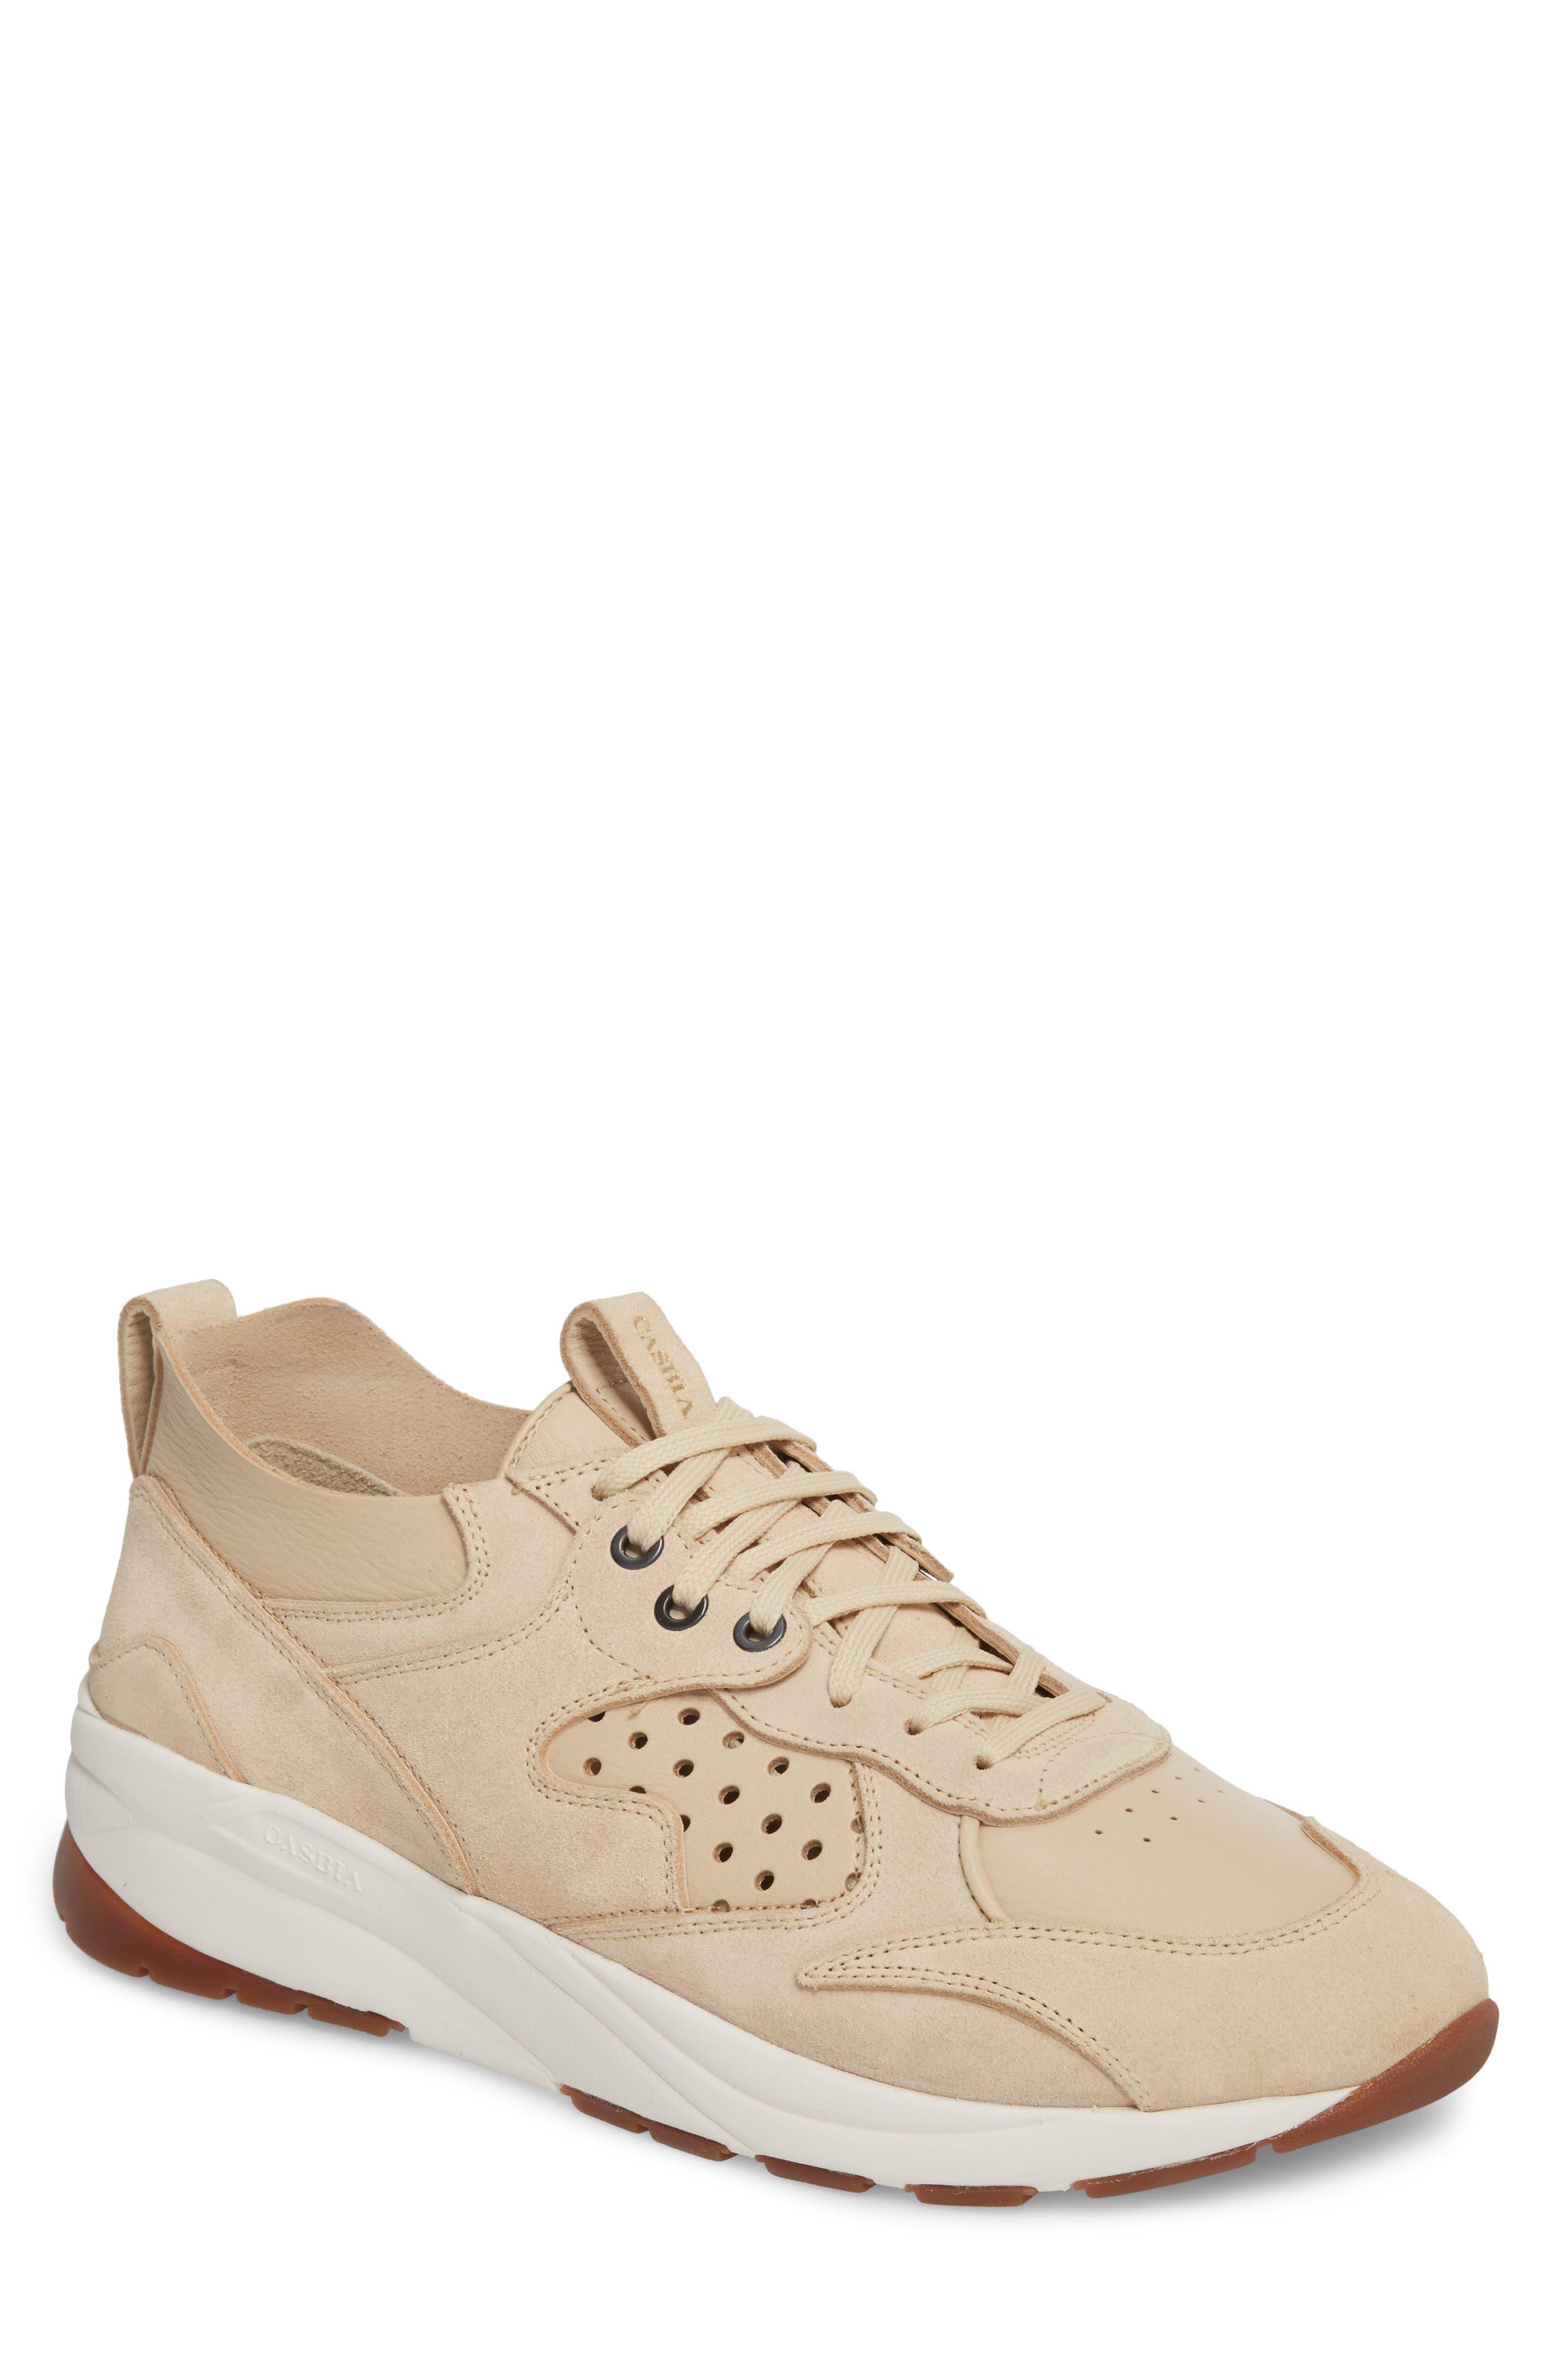 Casbia Champion Veloce Sneaker (Men)